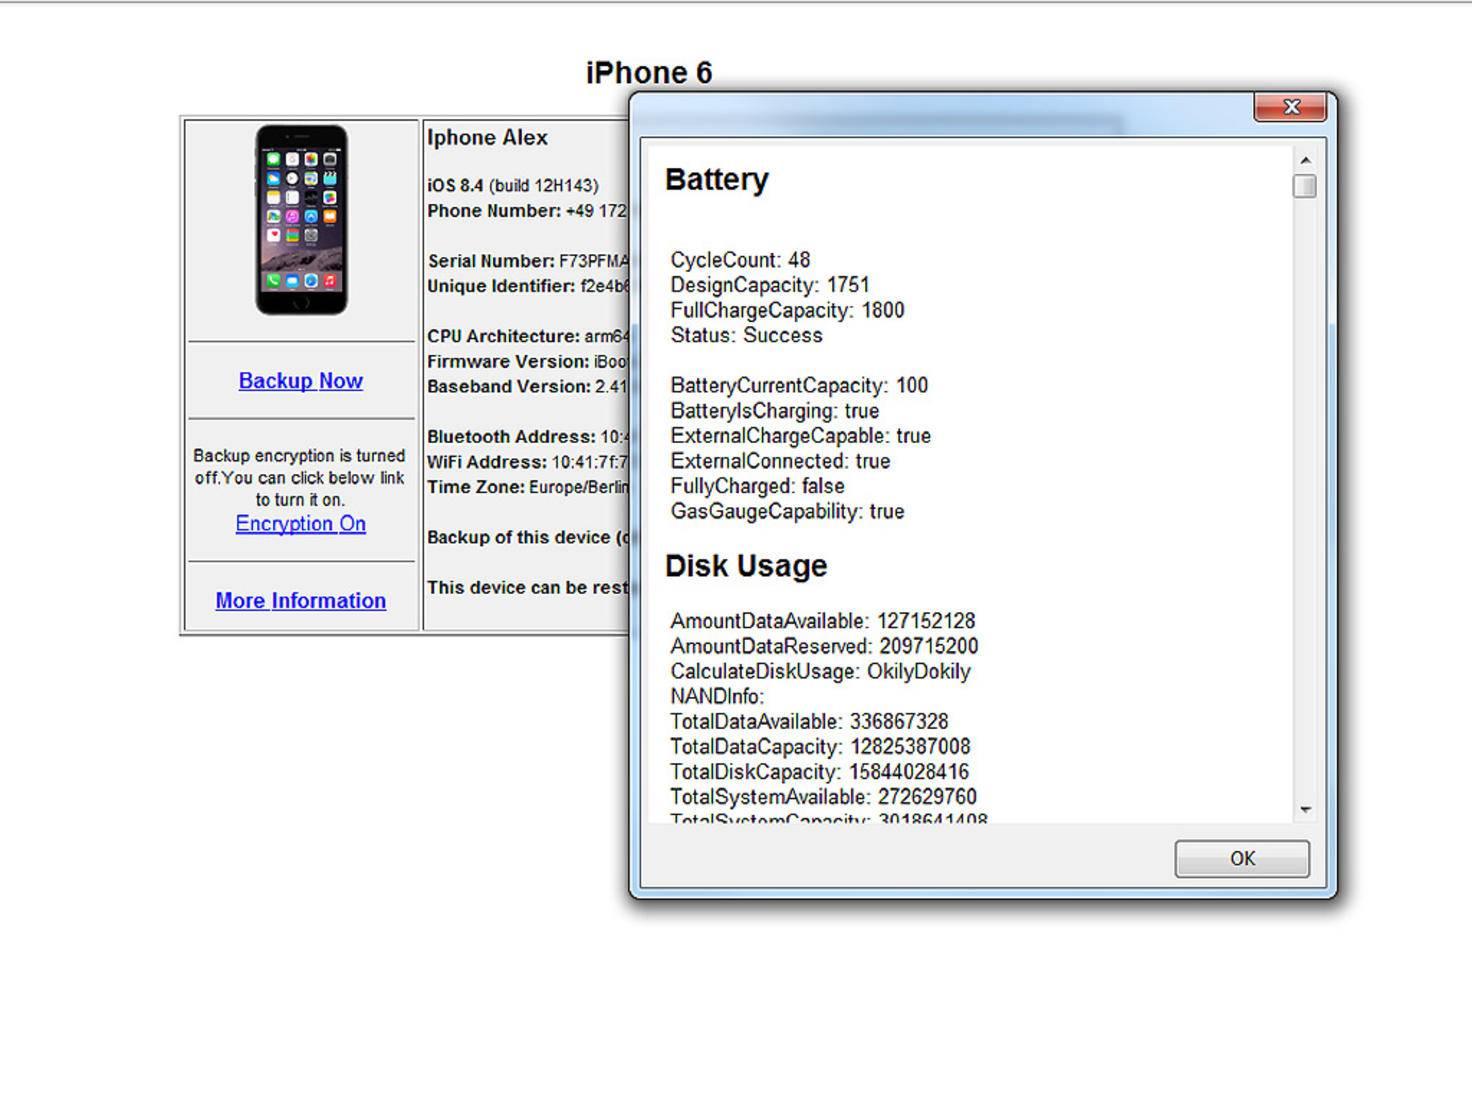 iPhone Akku Ladezyklen